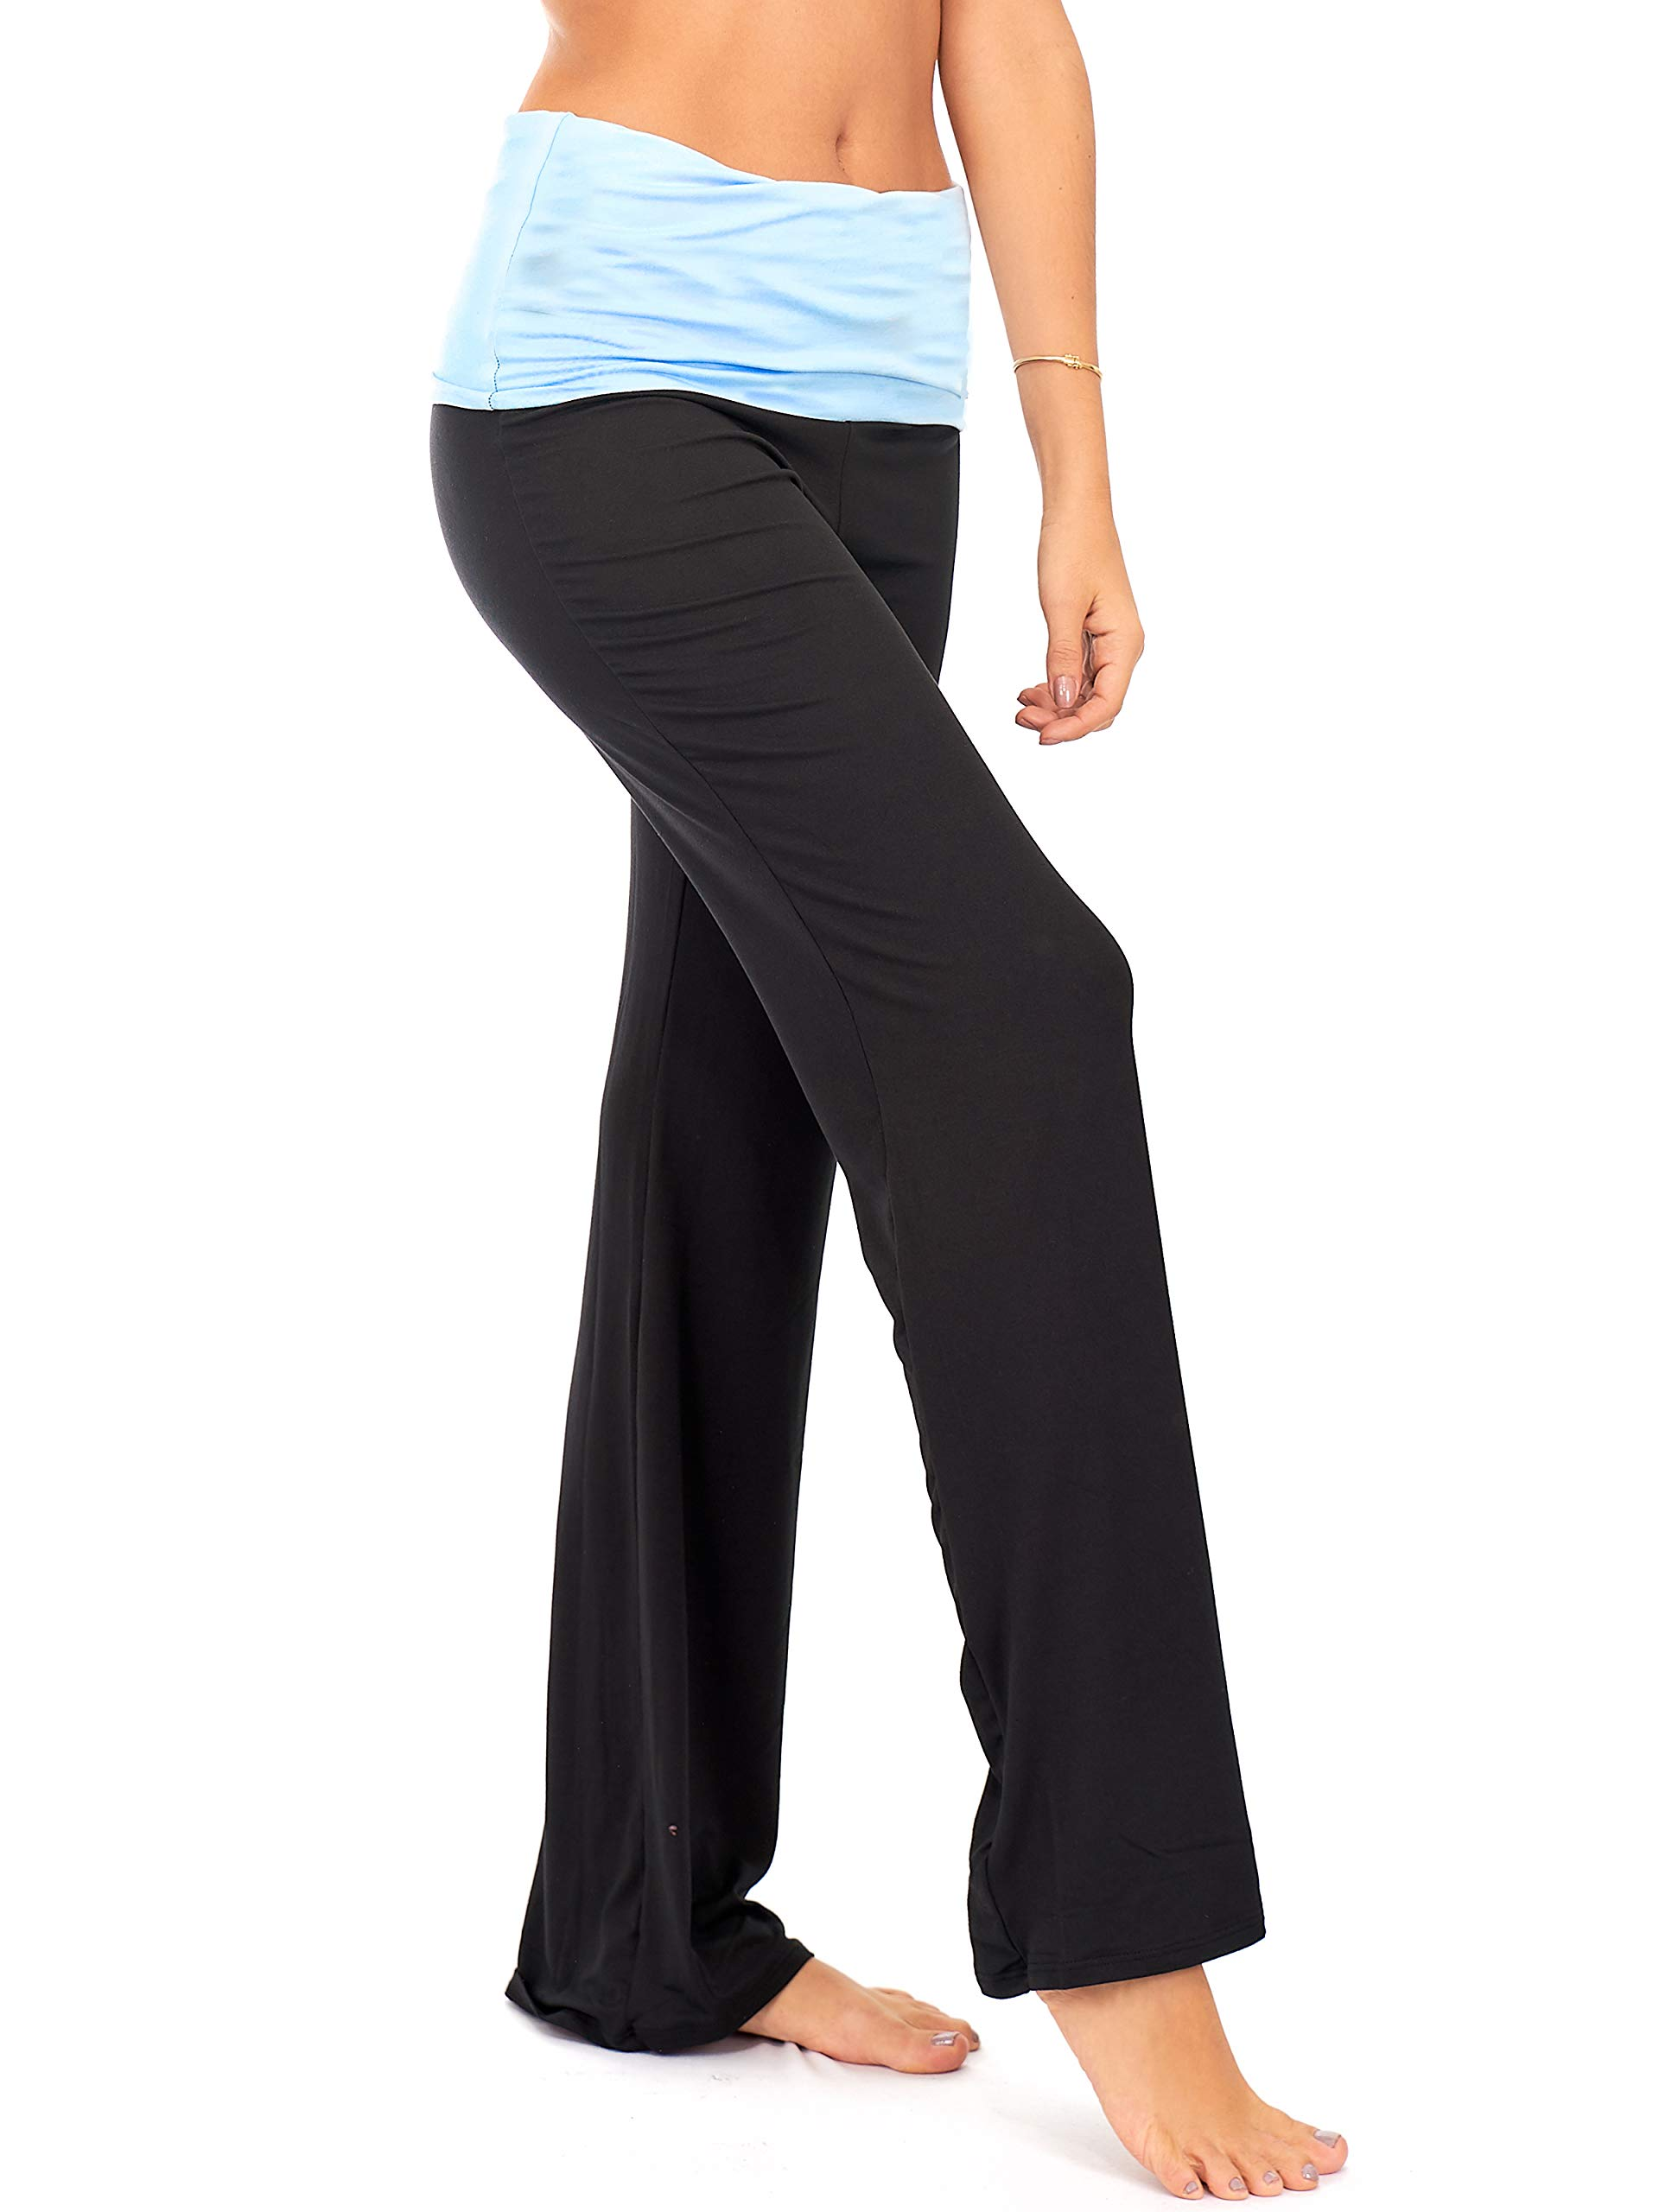 DEAR SPARKLE Fold Over Yoga Lounge Stretch Pants Women | Contrasting High Waist Loose Pregnancy Pant Plus (P8)